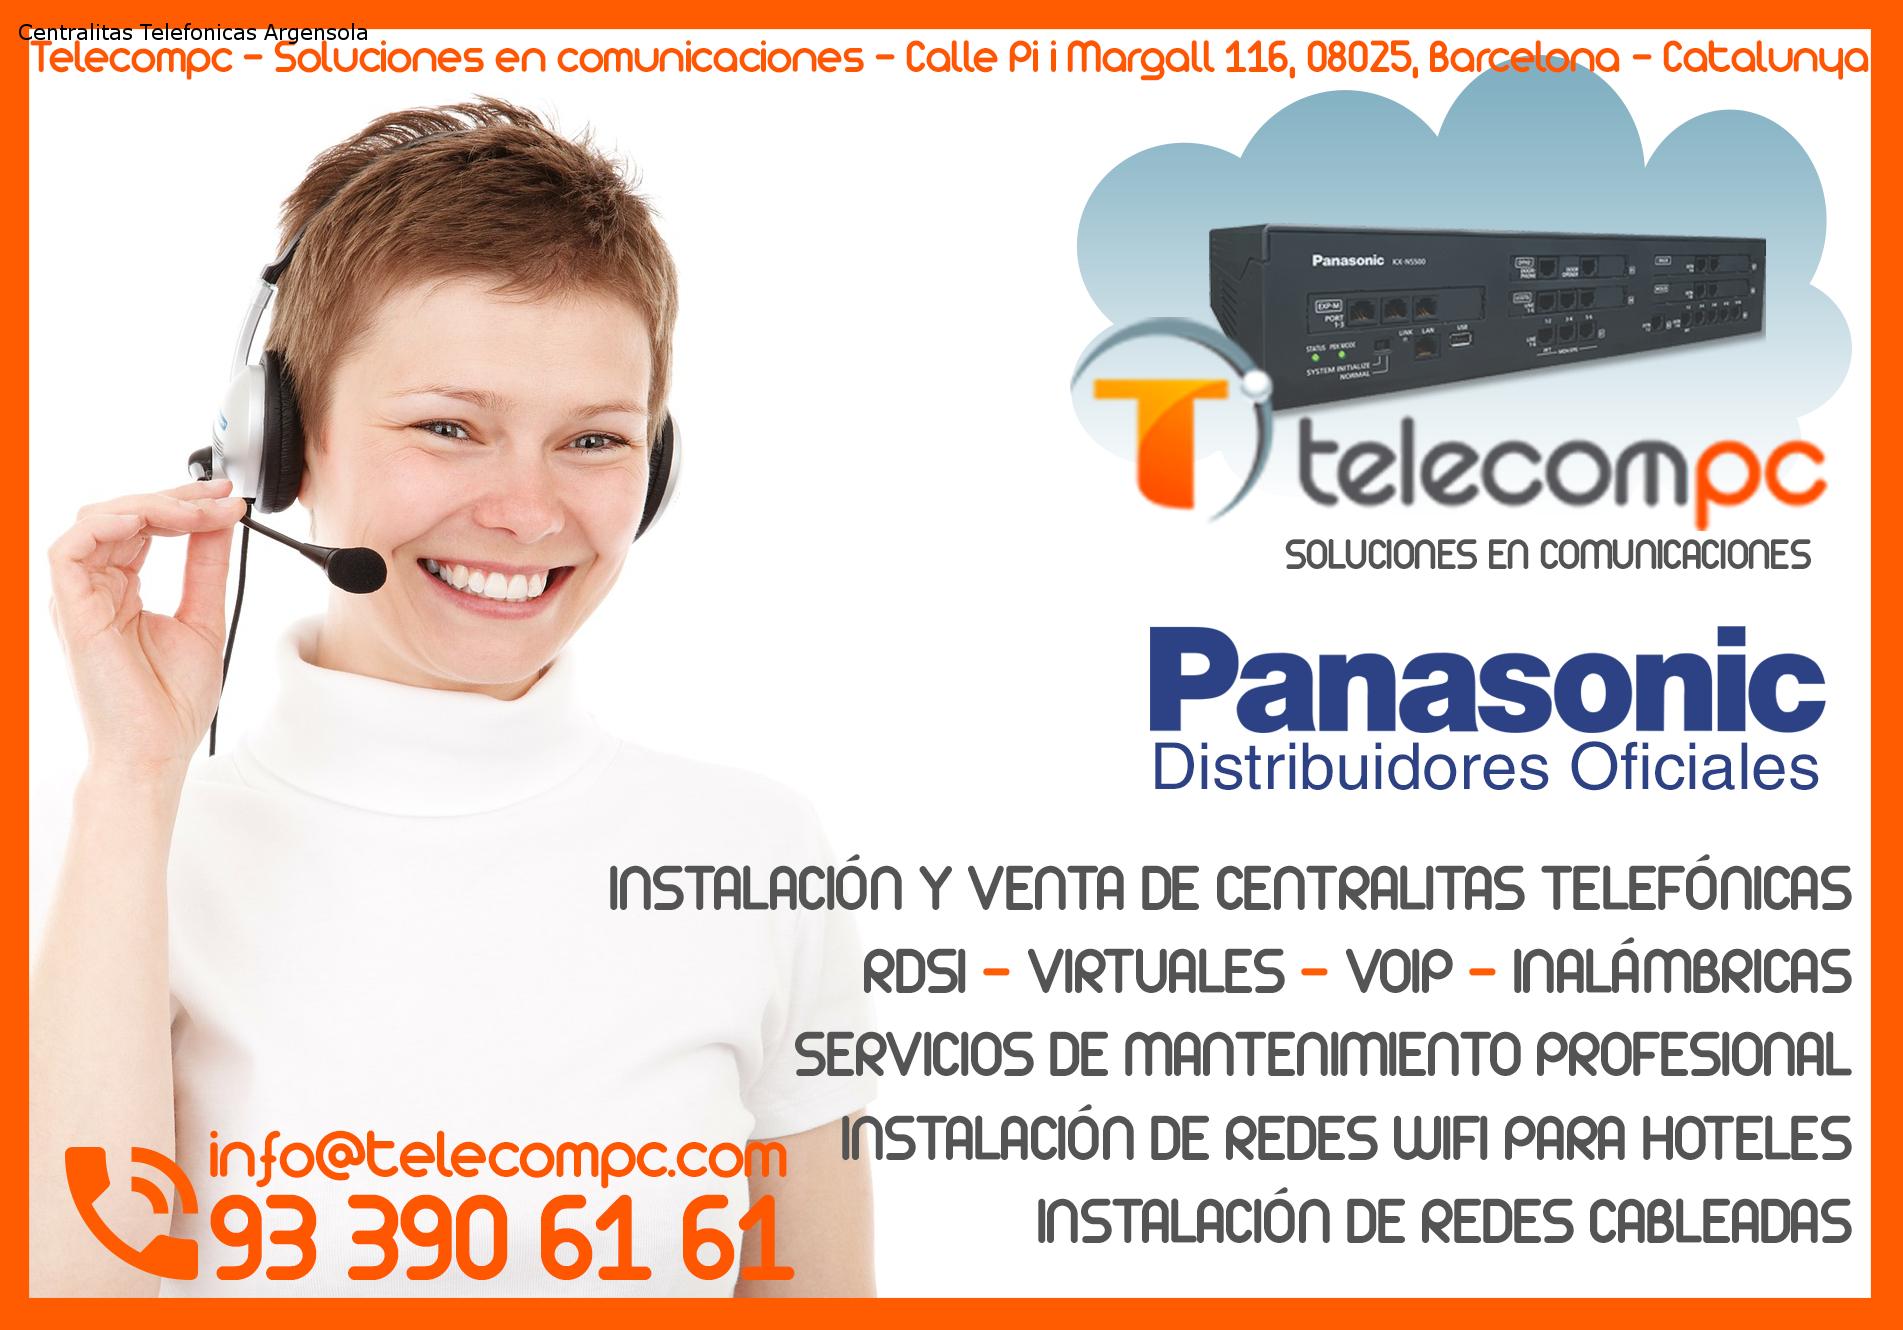 Centralitas Telefonicas Argensola